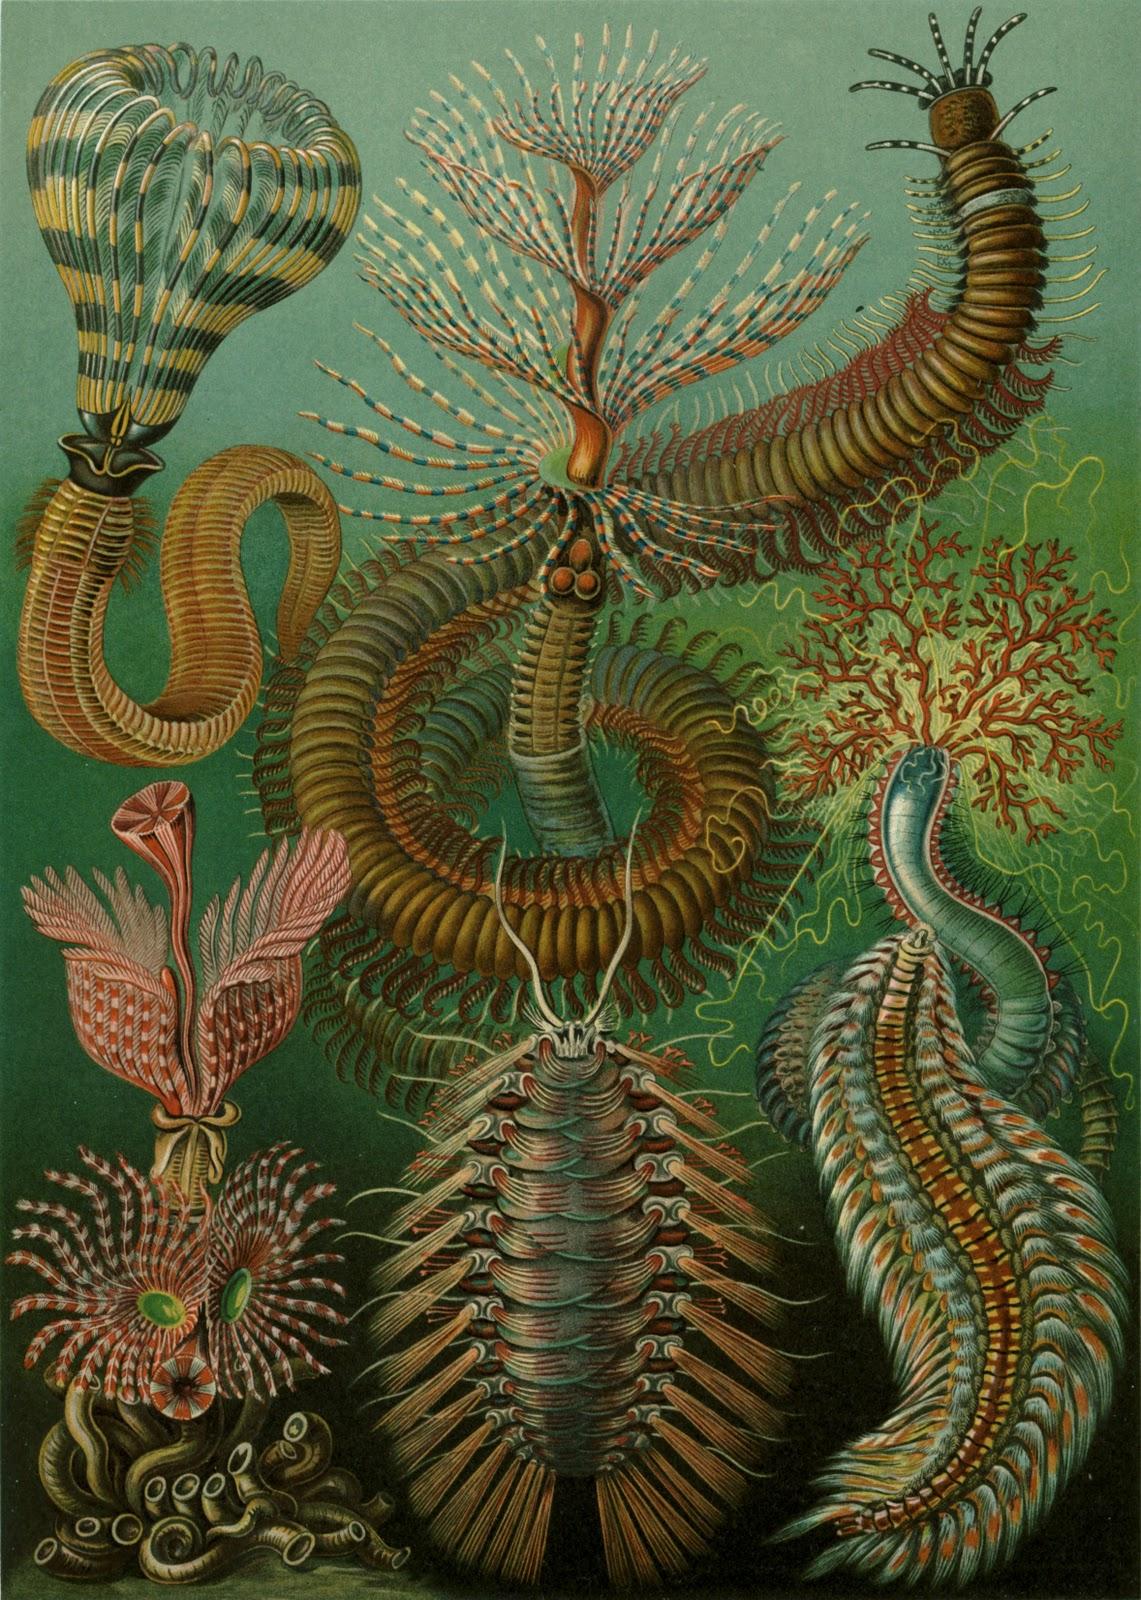 Reggaepsyc Ernst Haeckel